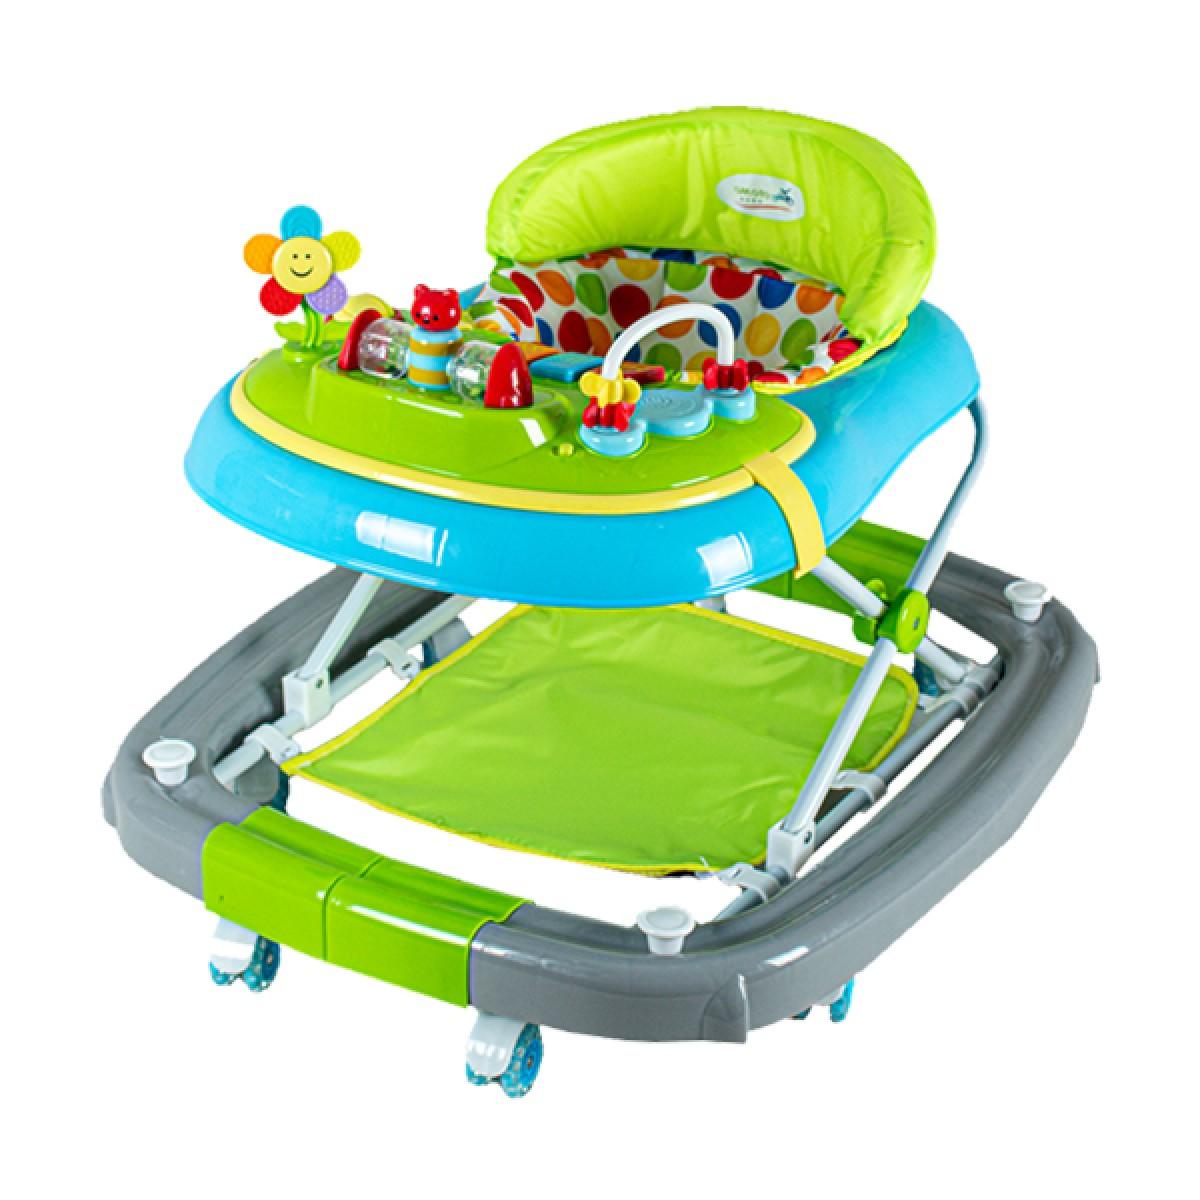 Noronha Baby Walker Rocker - Kico Baby Center